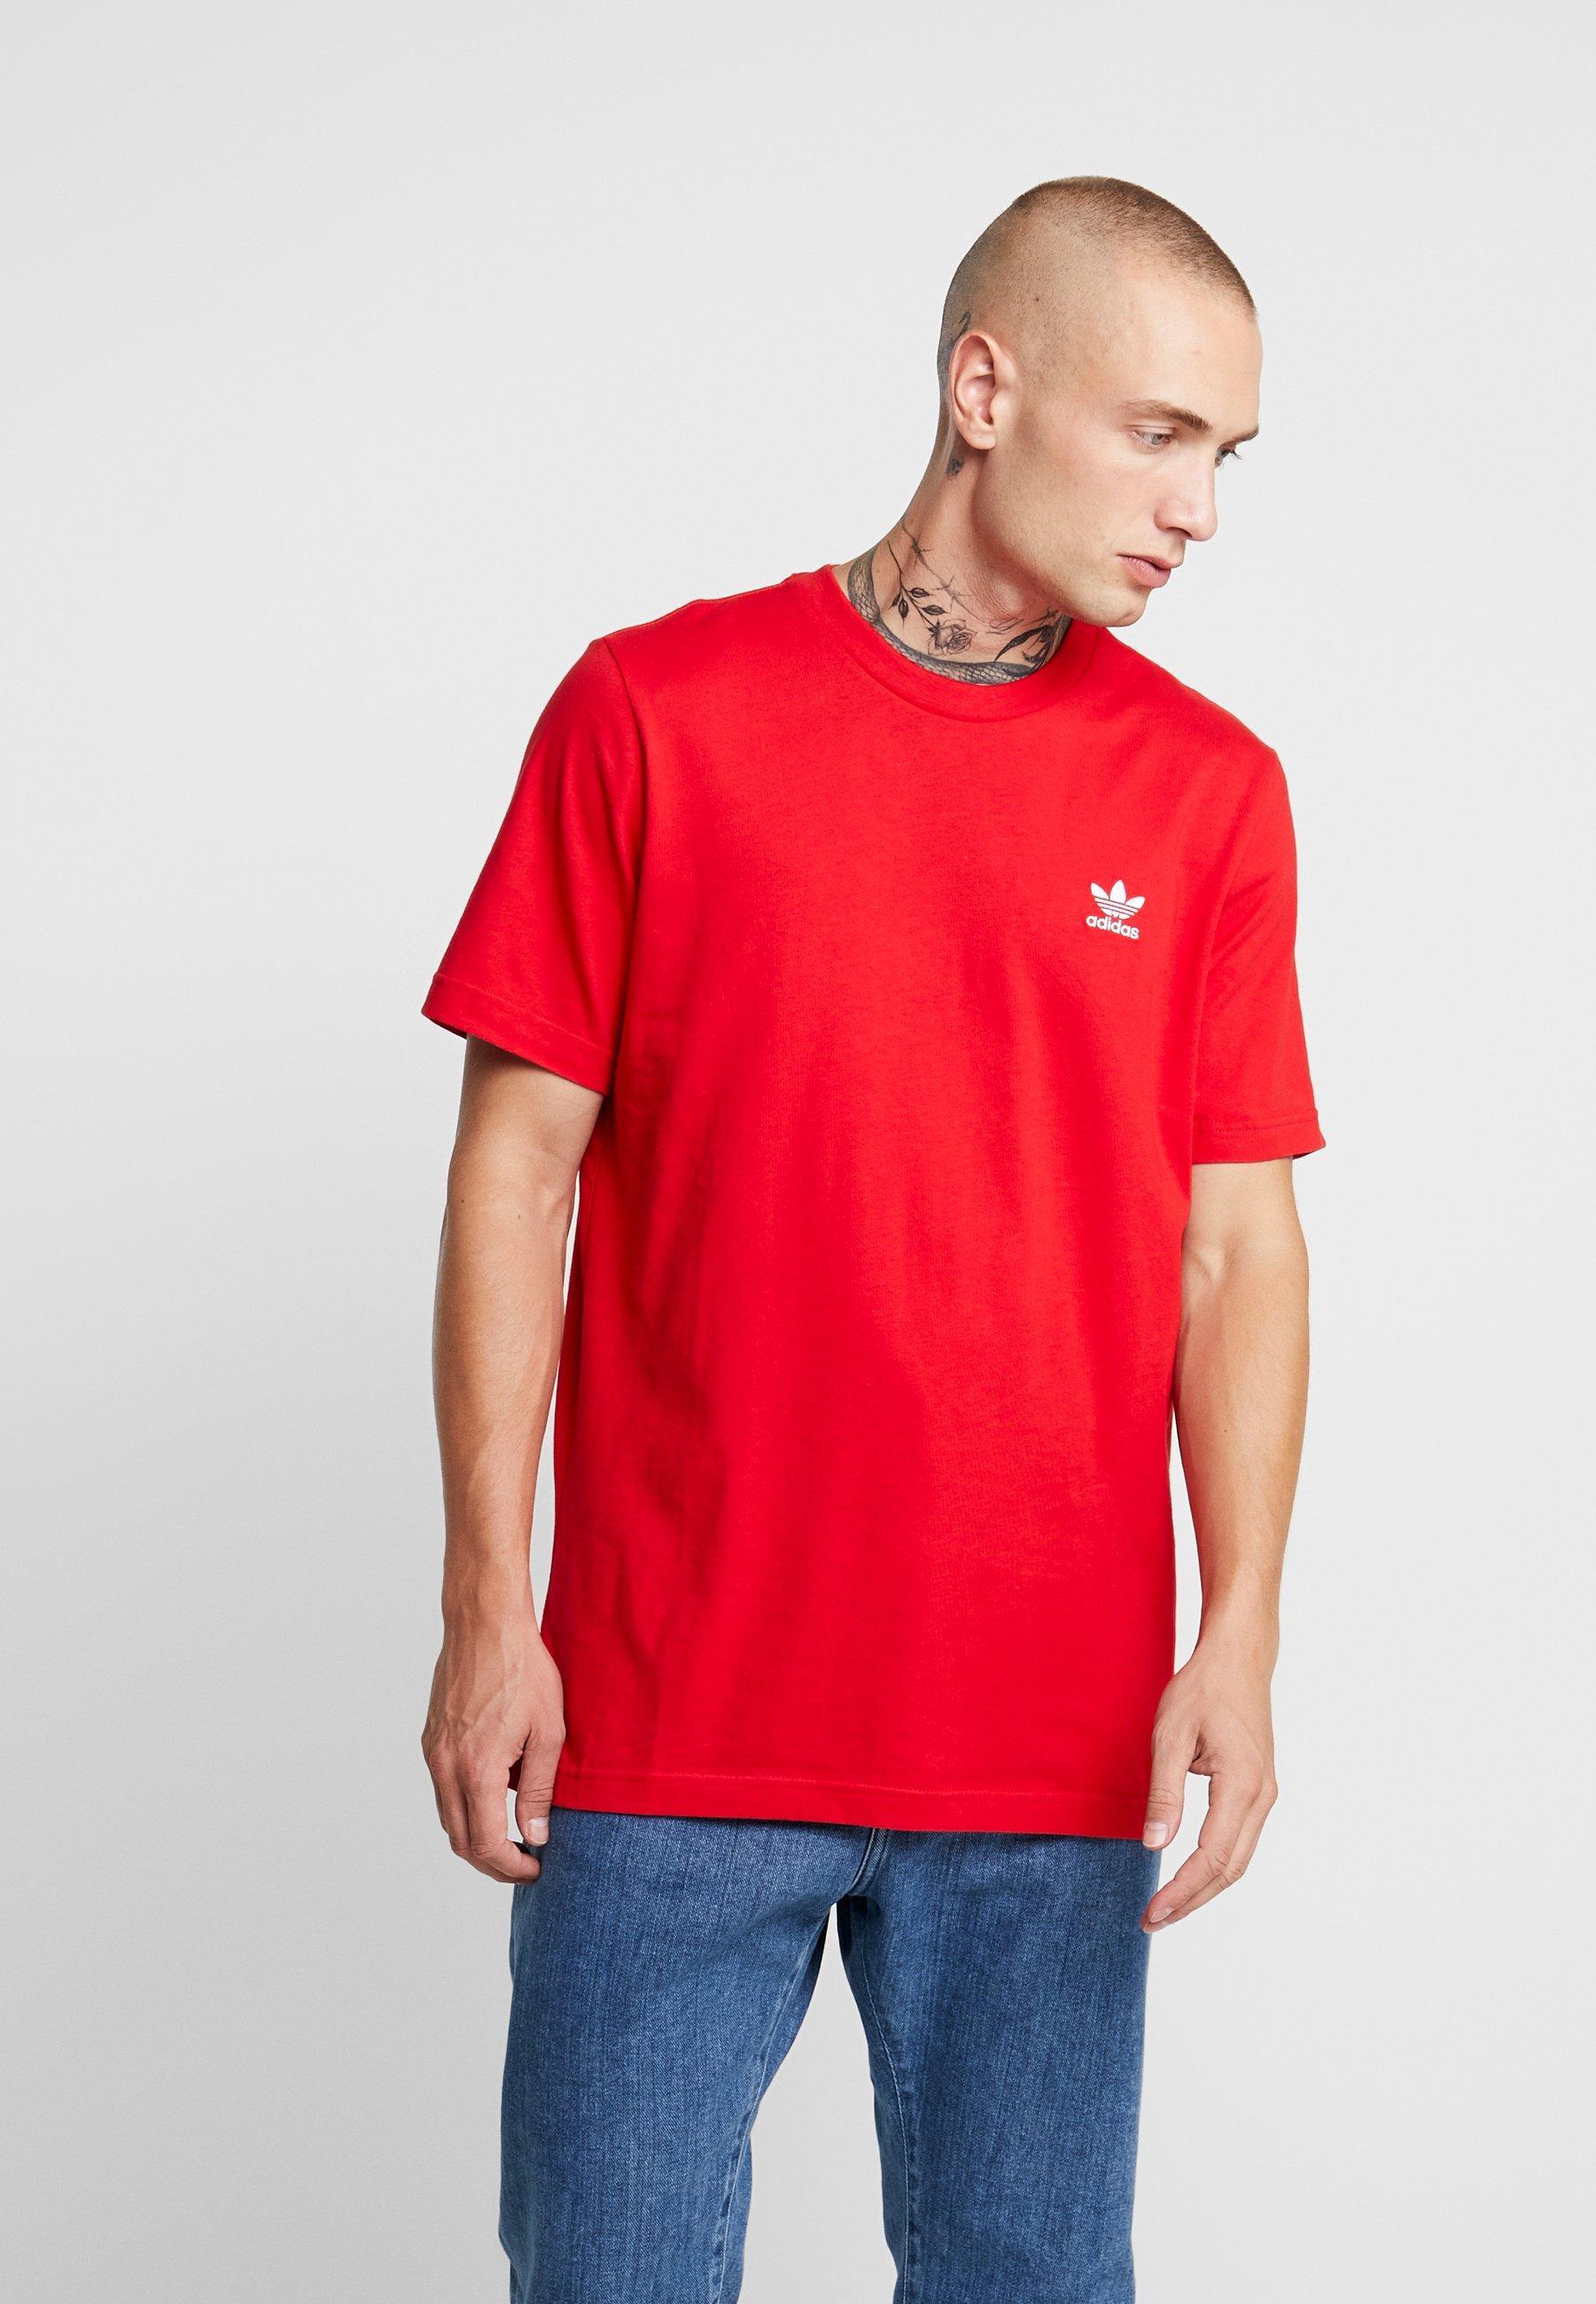 Originals Adidas TeeT Basique Essential shirt Scarlet lJcKF3uT1